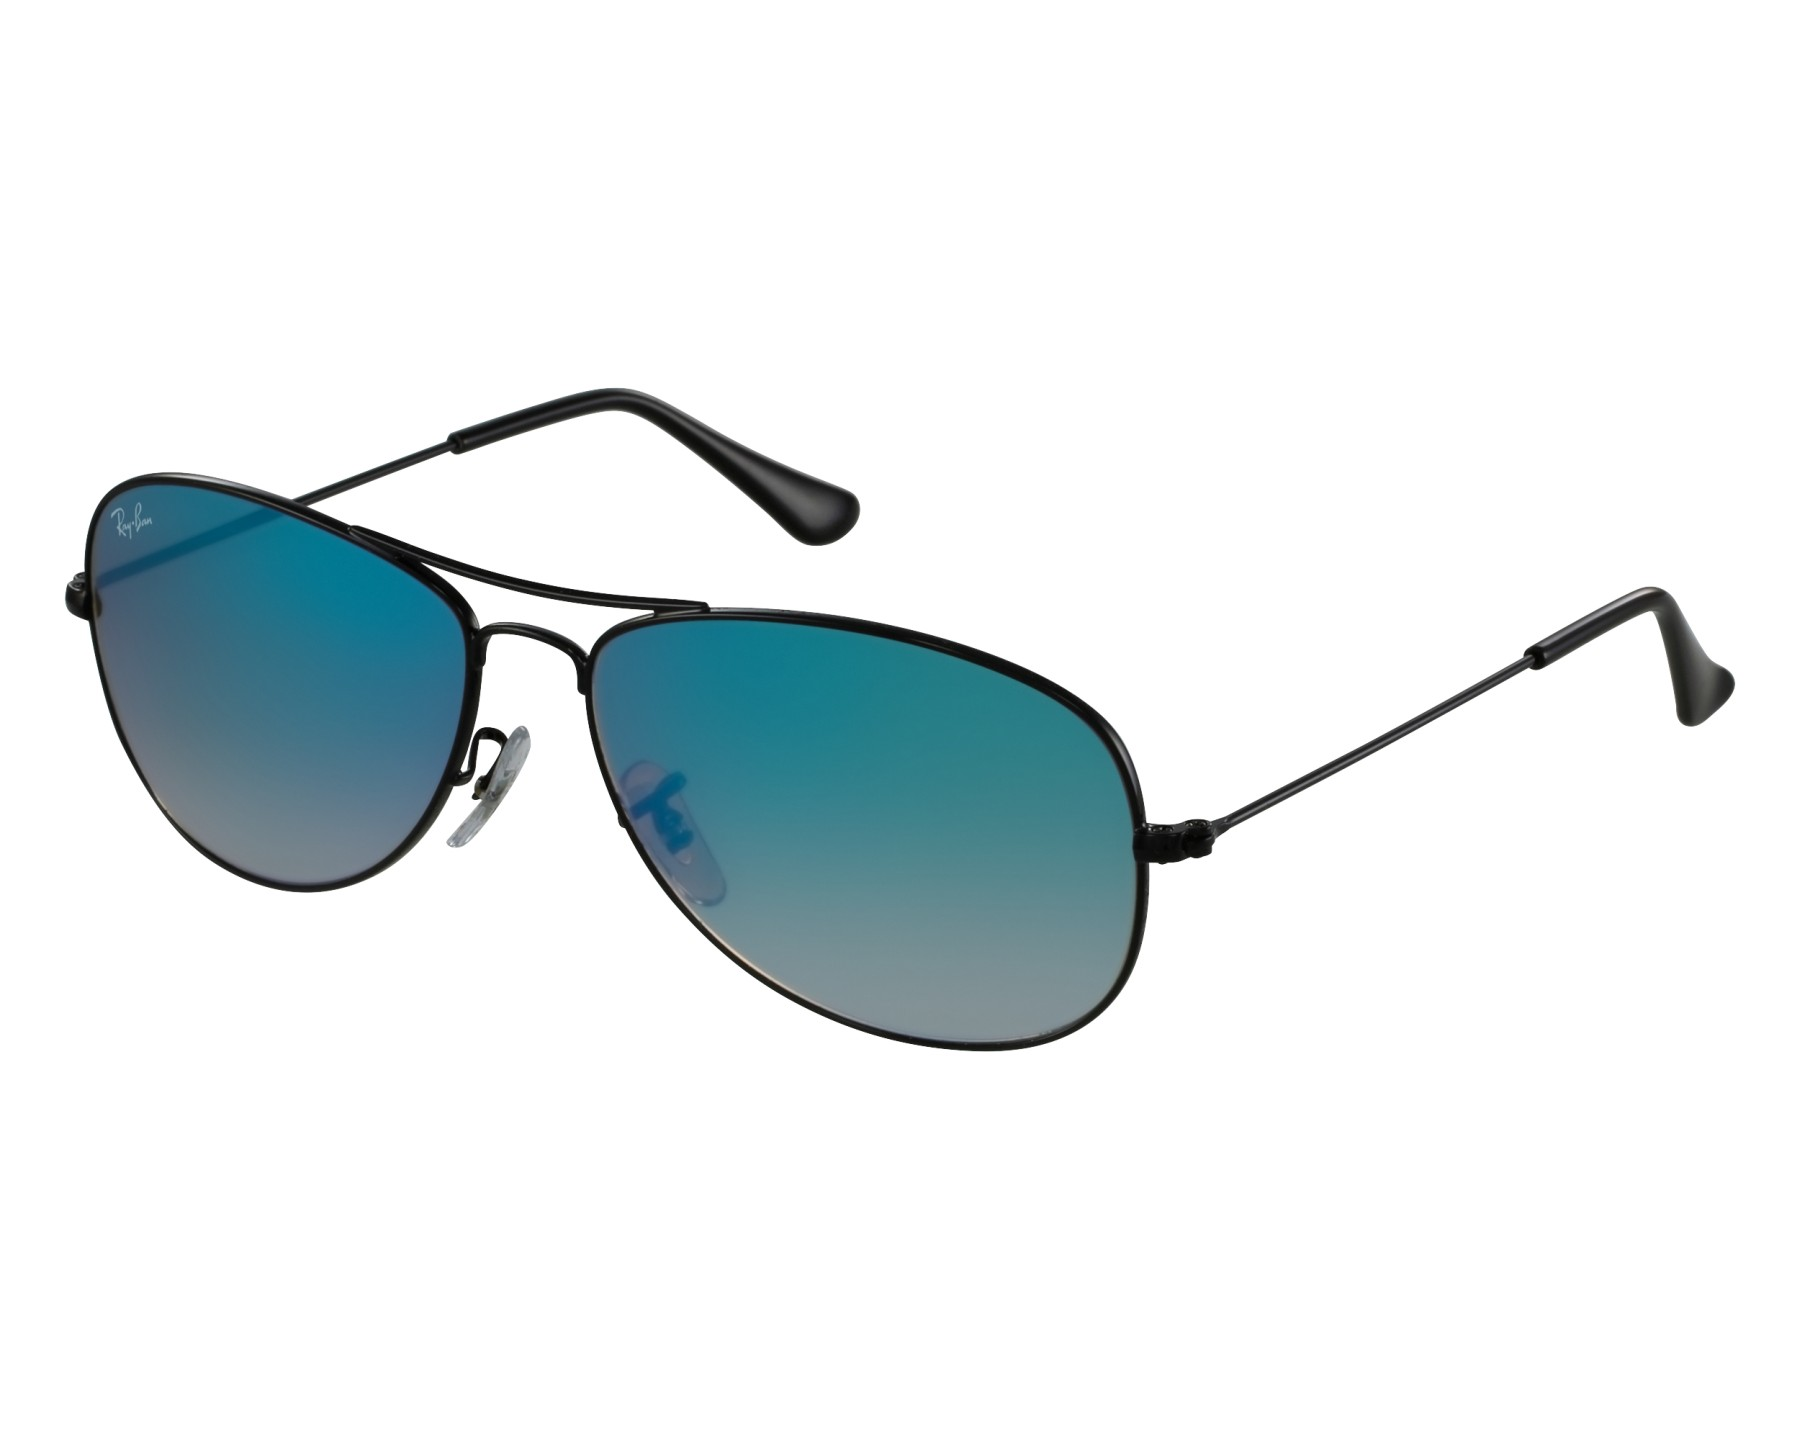 ray ban sunglasses rb 3362 002 4o black visionet usa. Black Bedroom Furniture Sets. Home Design Ideas